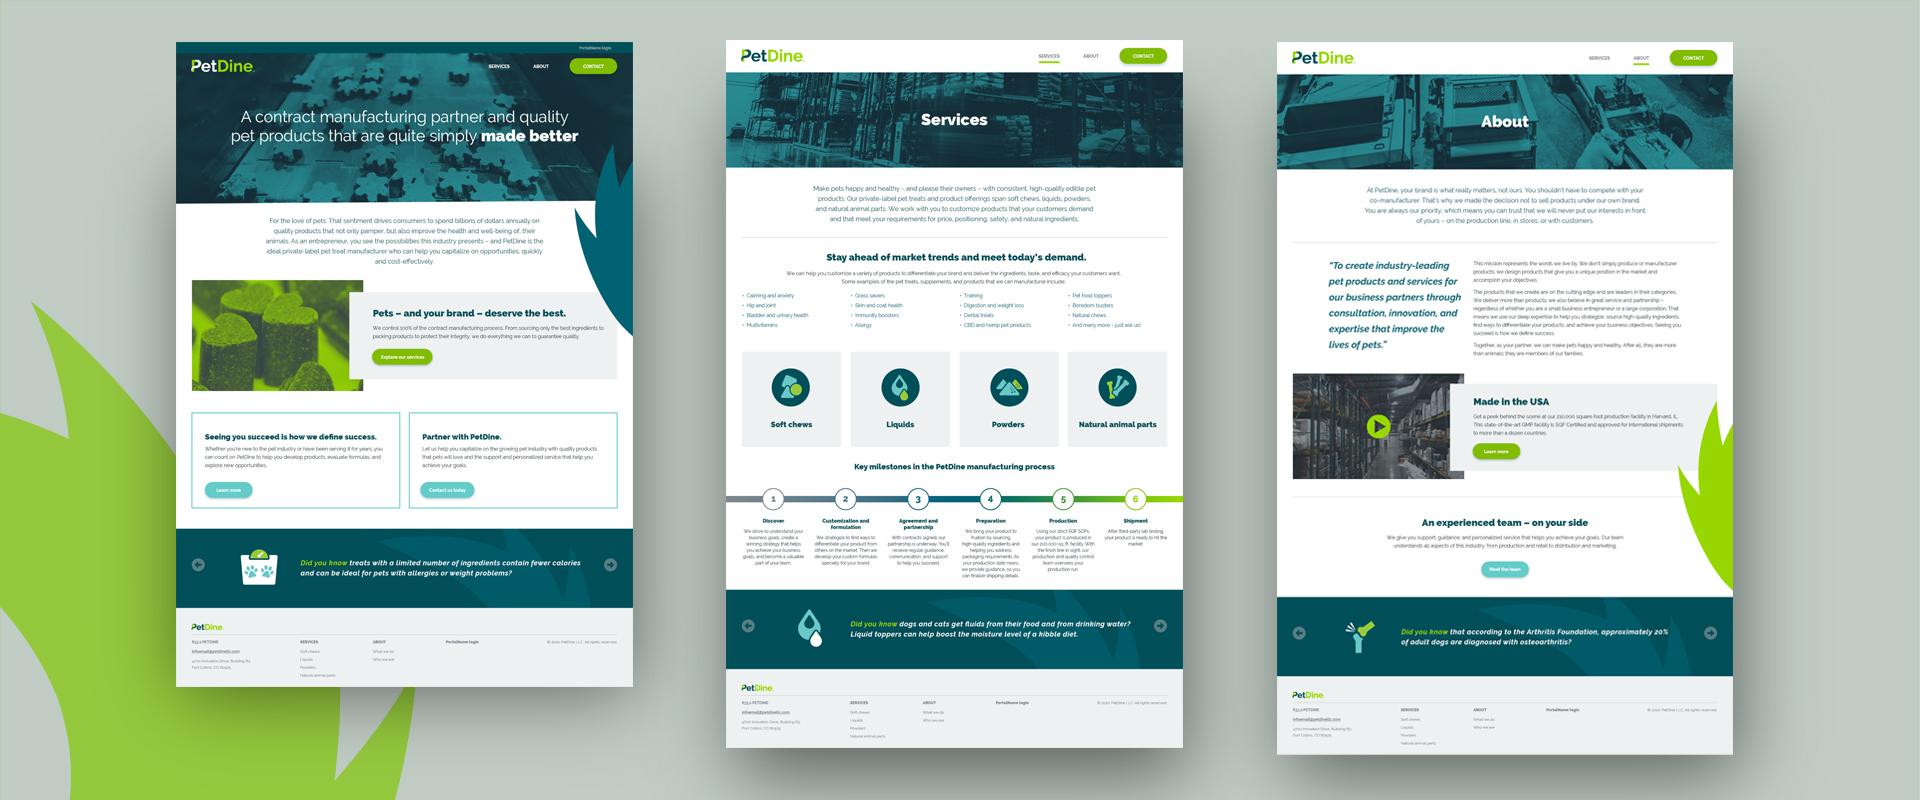 PetDine web page design